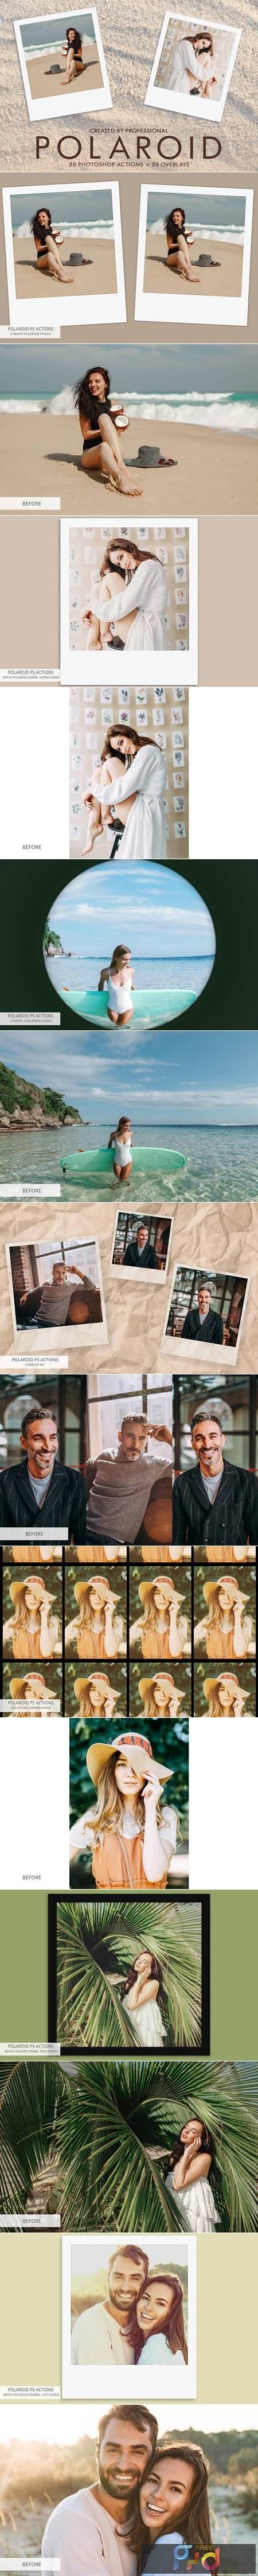 Polaroid Photoshop Actions 5428546 1